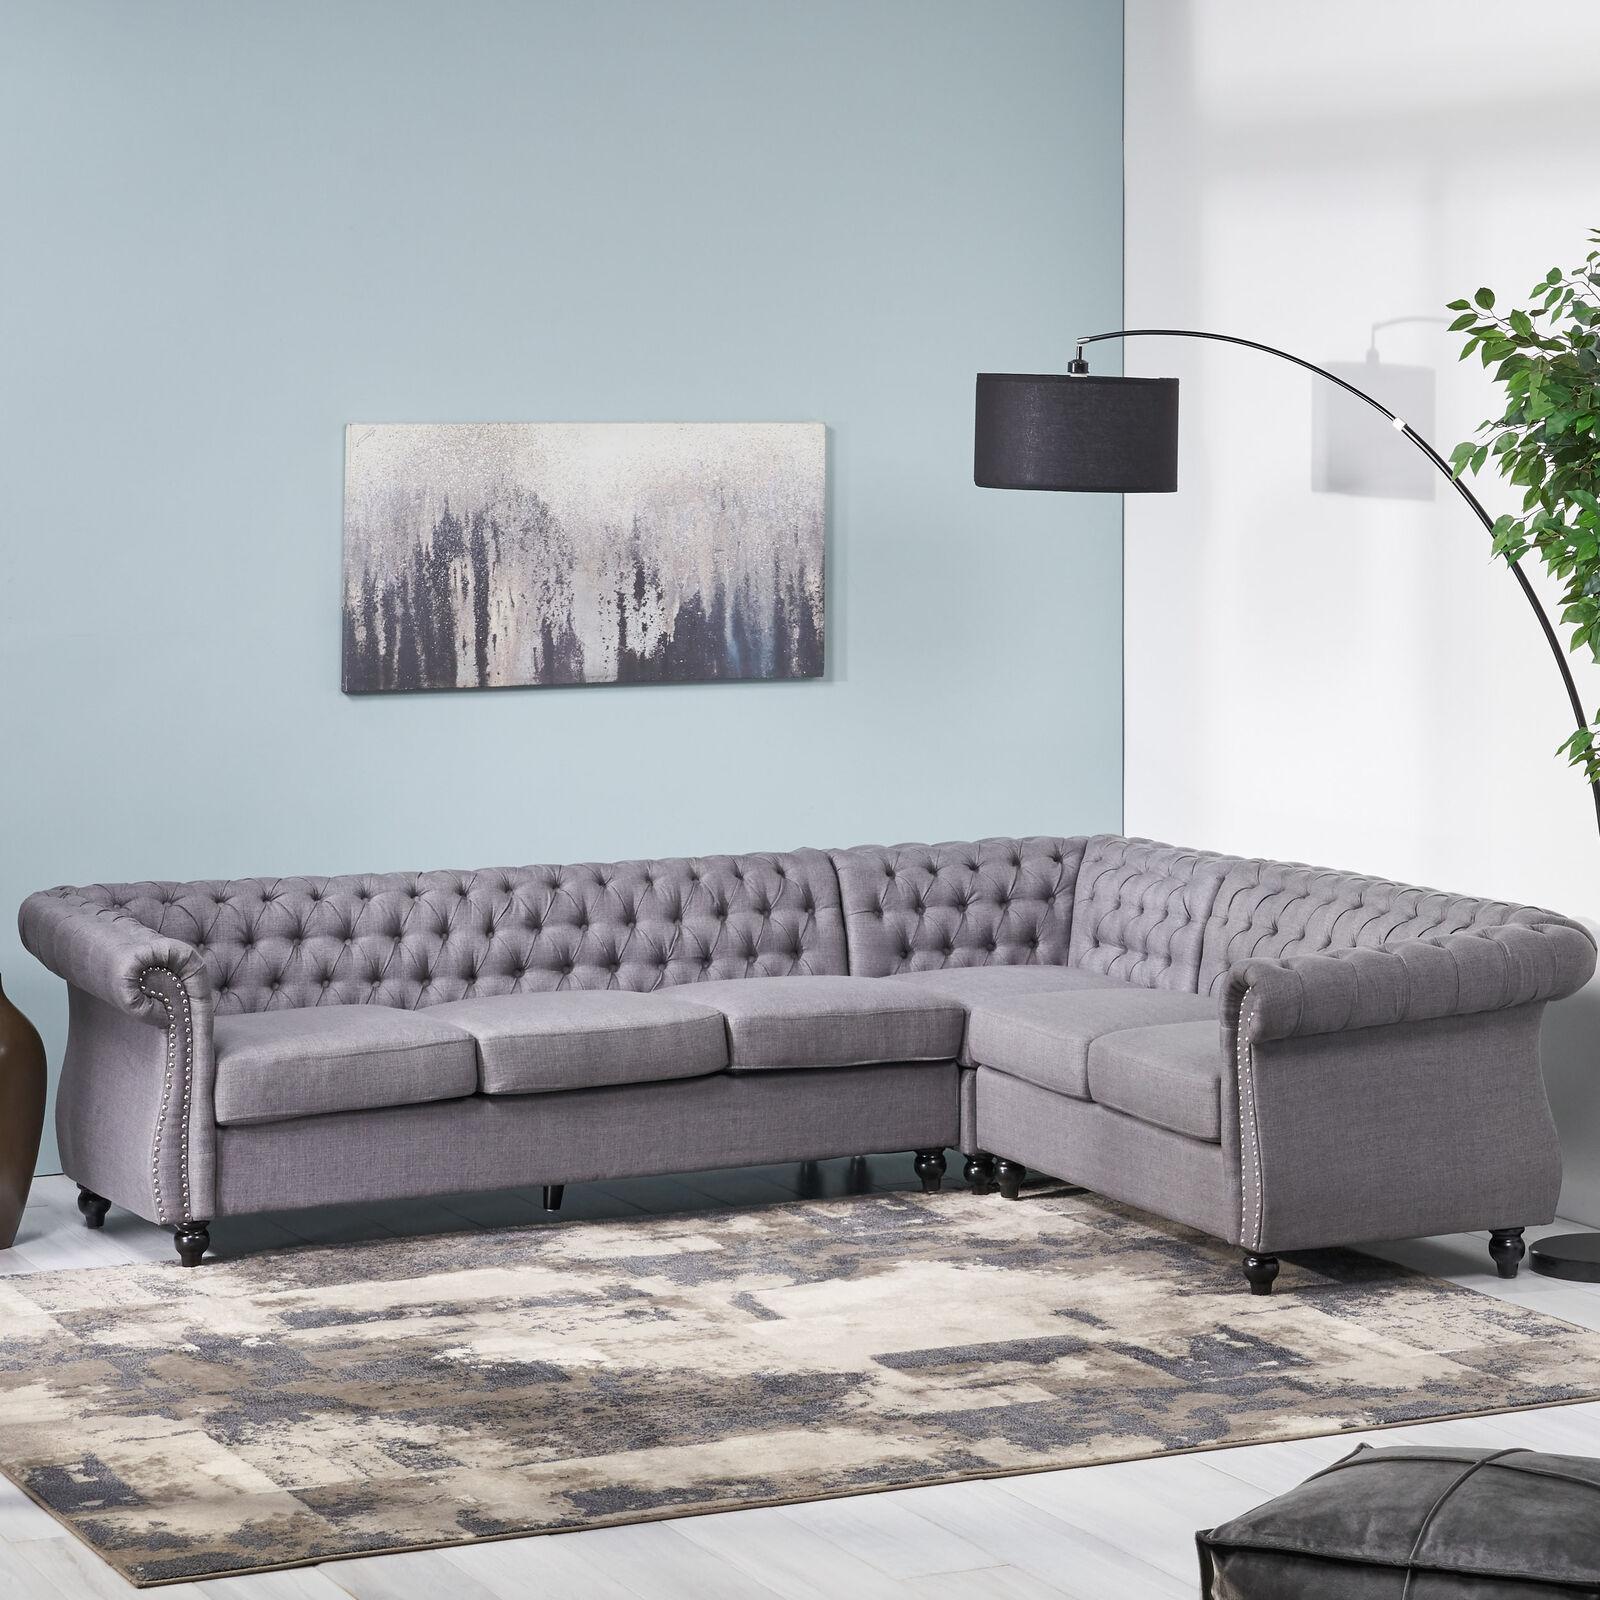 Amberside 6 Seater Velvet Tufted Chesterfield Sectional Furniture